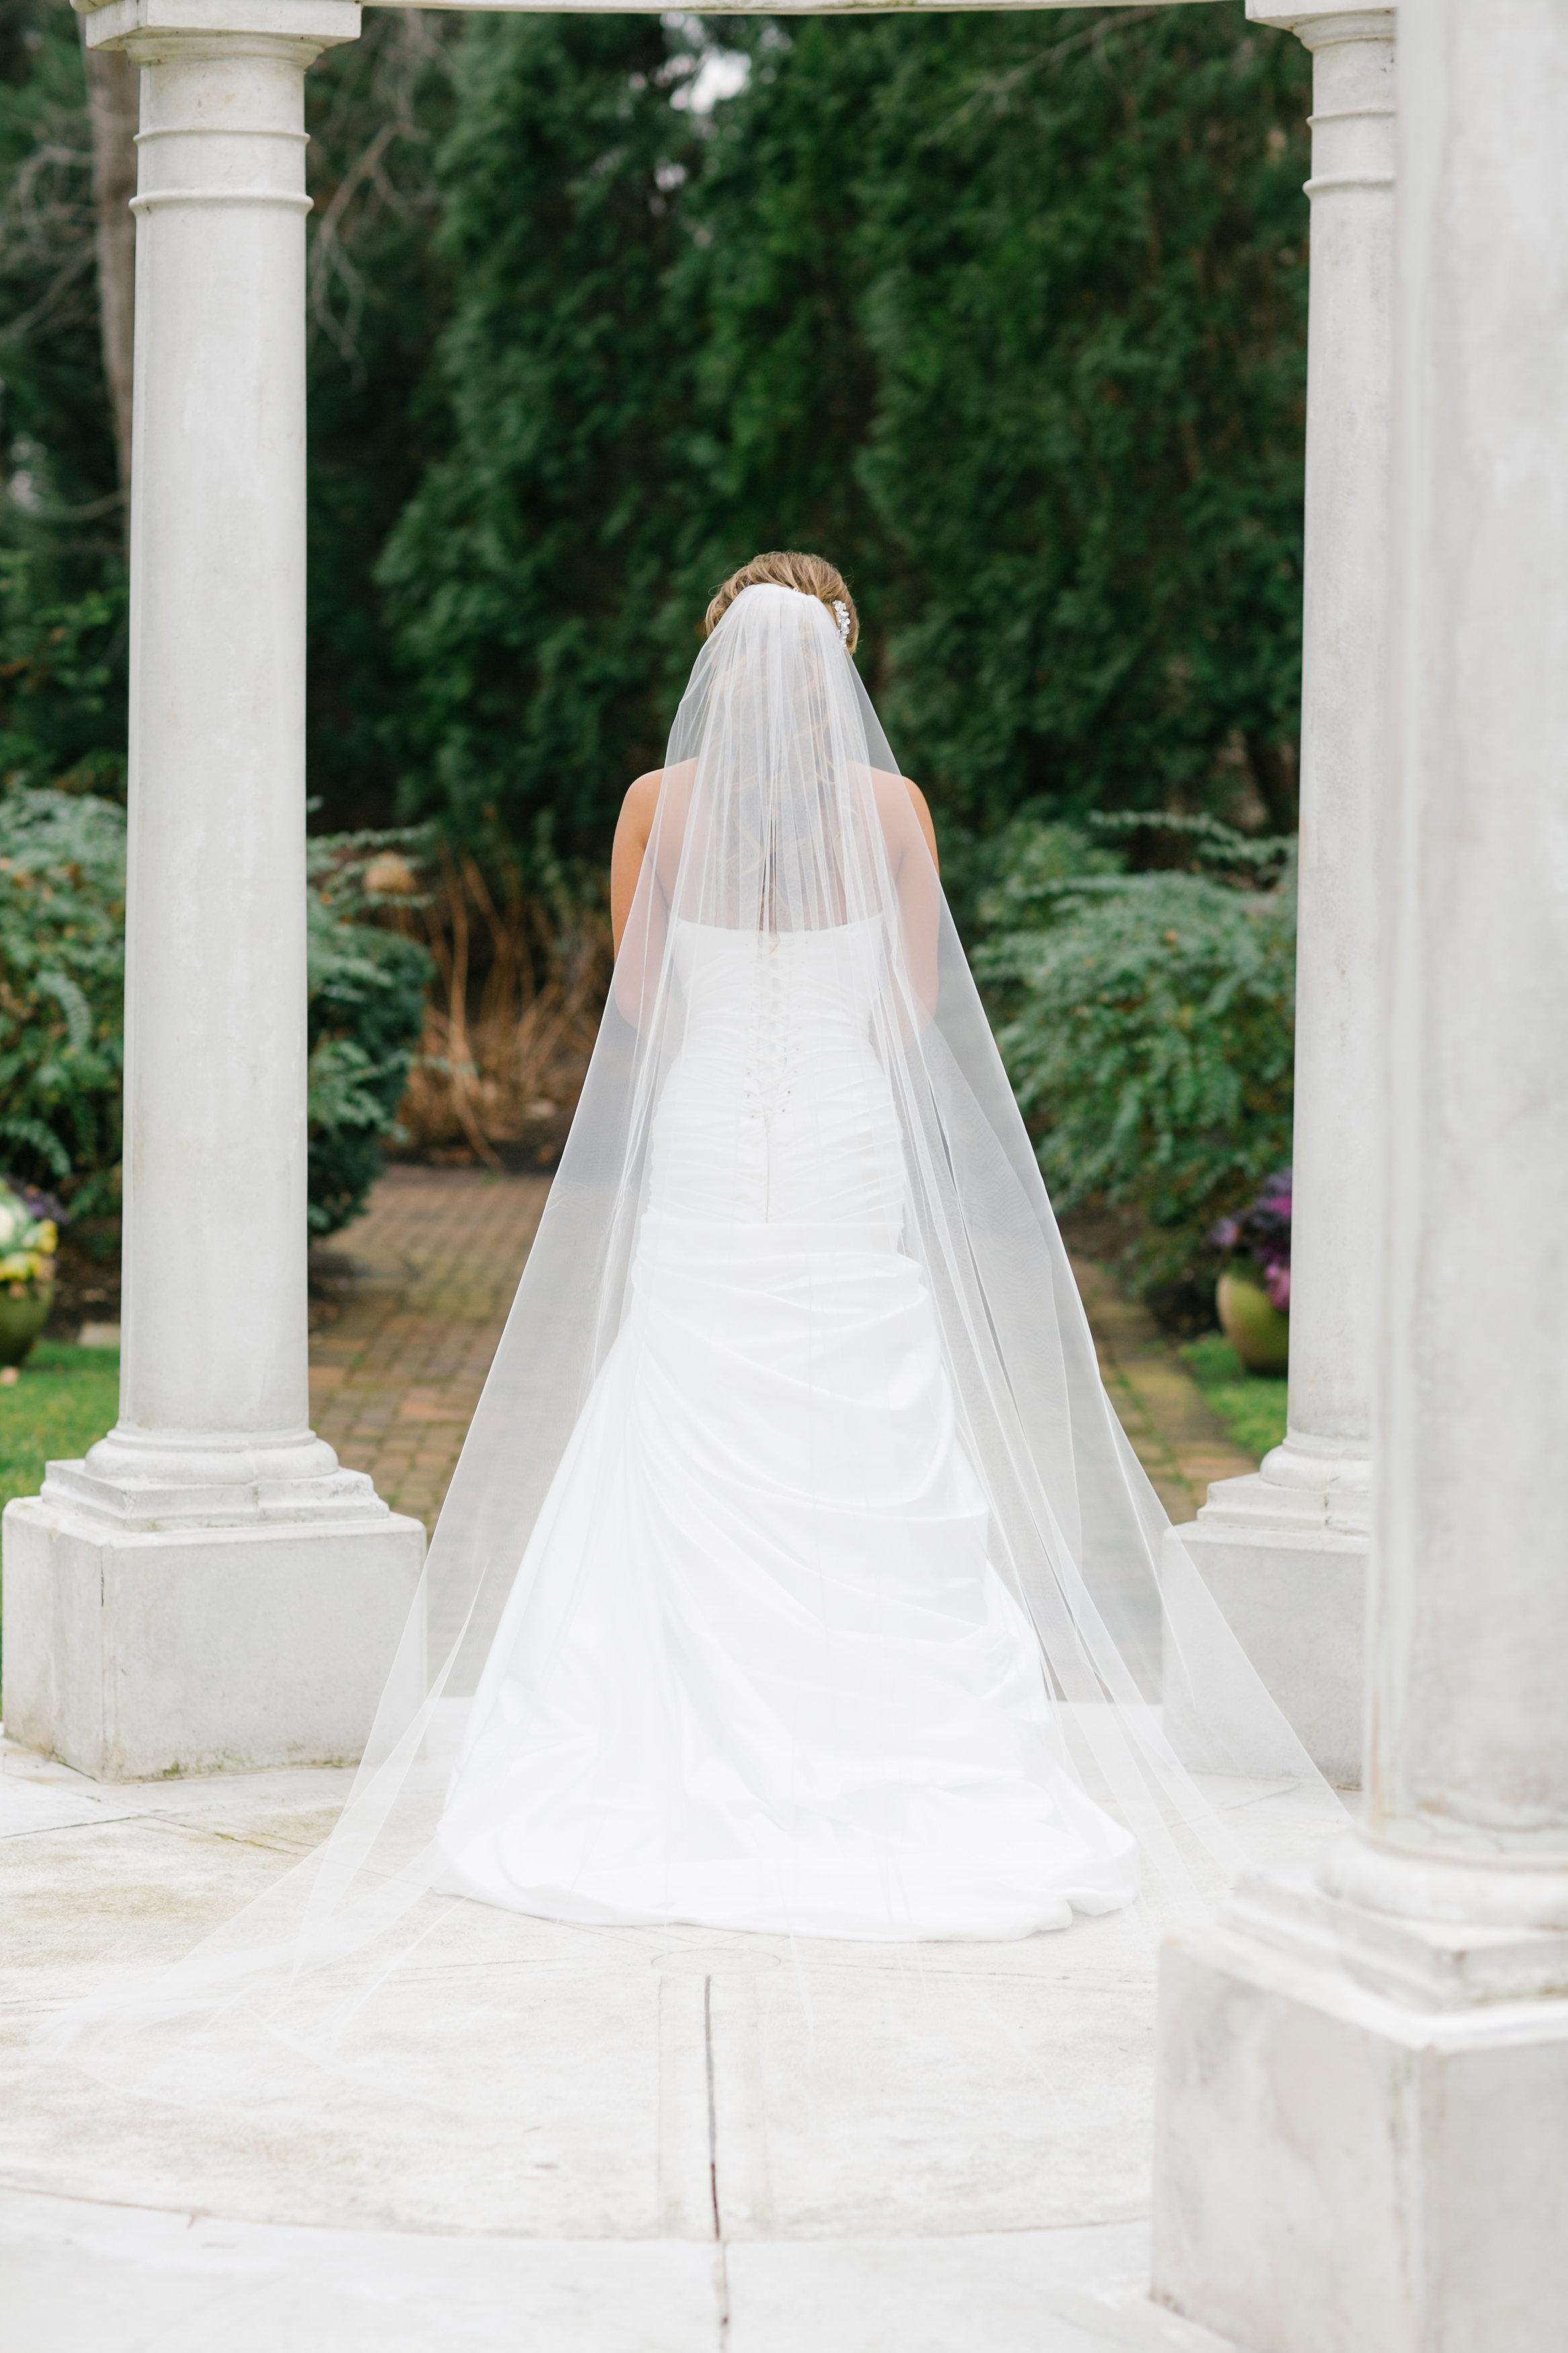 Ceci_New_York_Custom_Invitation_ New_Jersey_Wedding_Luxury_Personalized_Ceci_Style_Bride_Foil_Stamping17.jpg